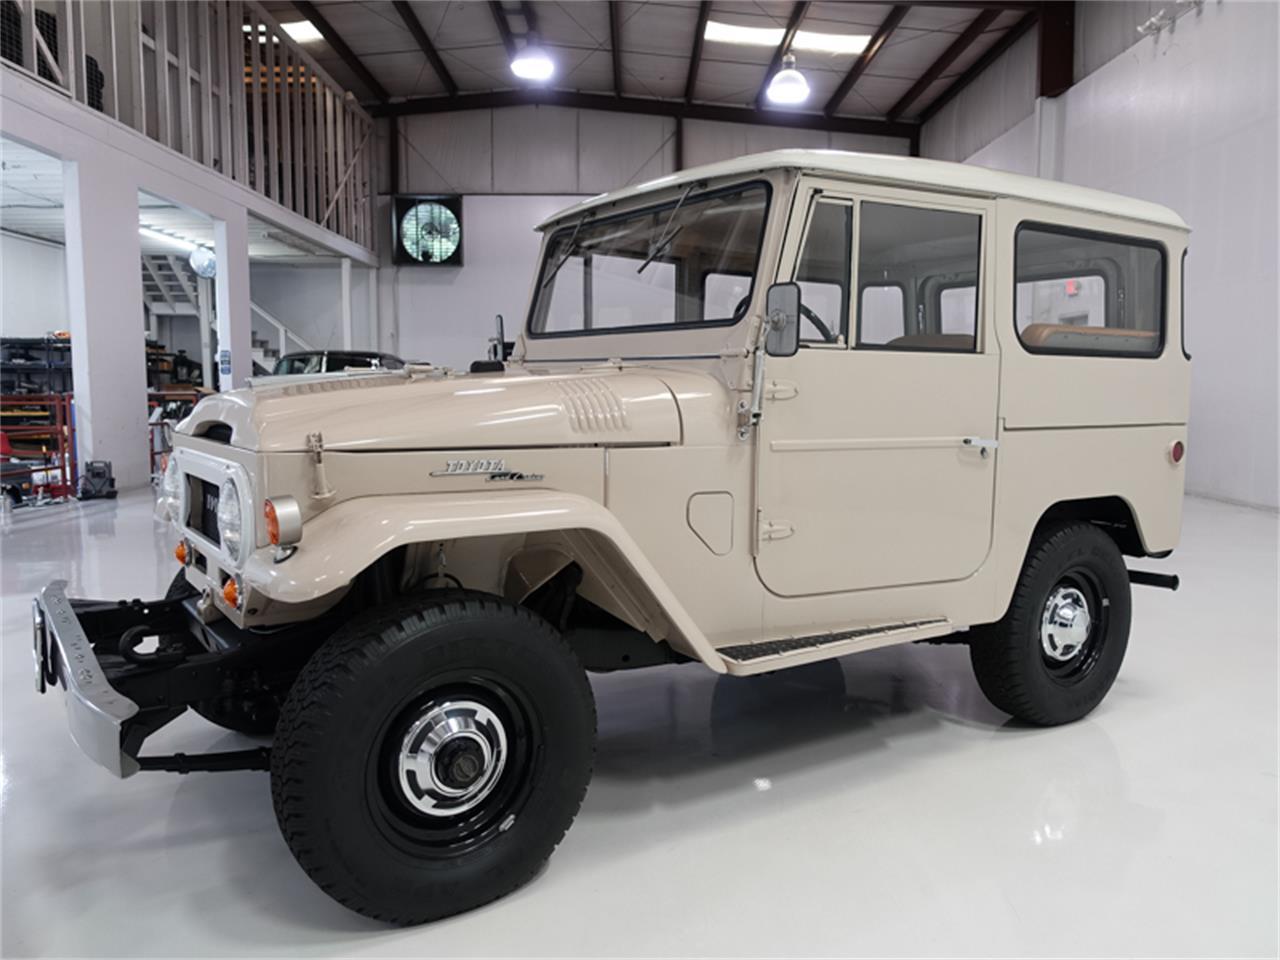 1967 Toyota Land Cruiser Fj40 For Sale Classiccars Com Cc 1087627